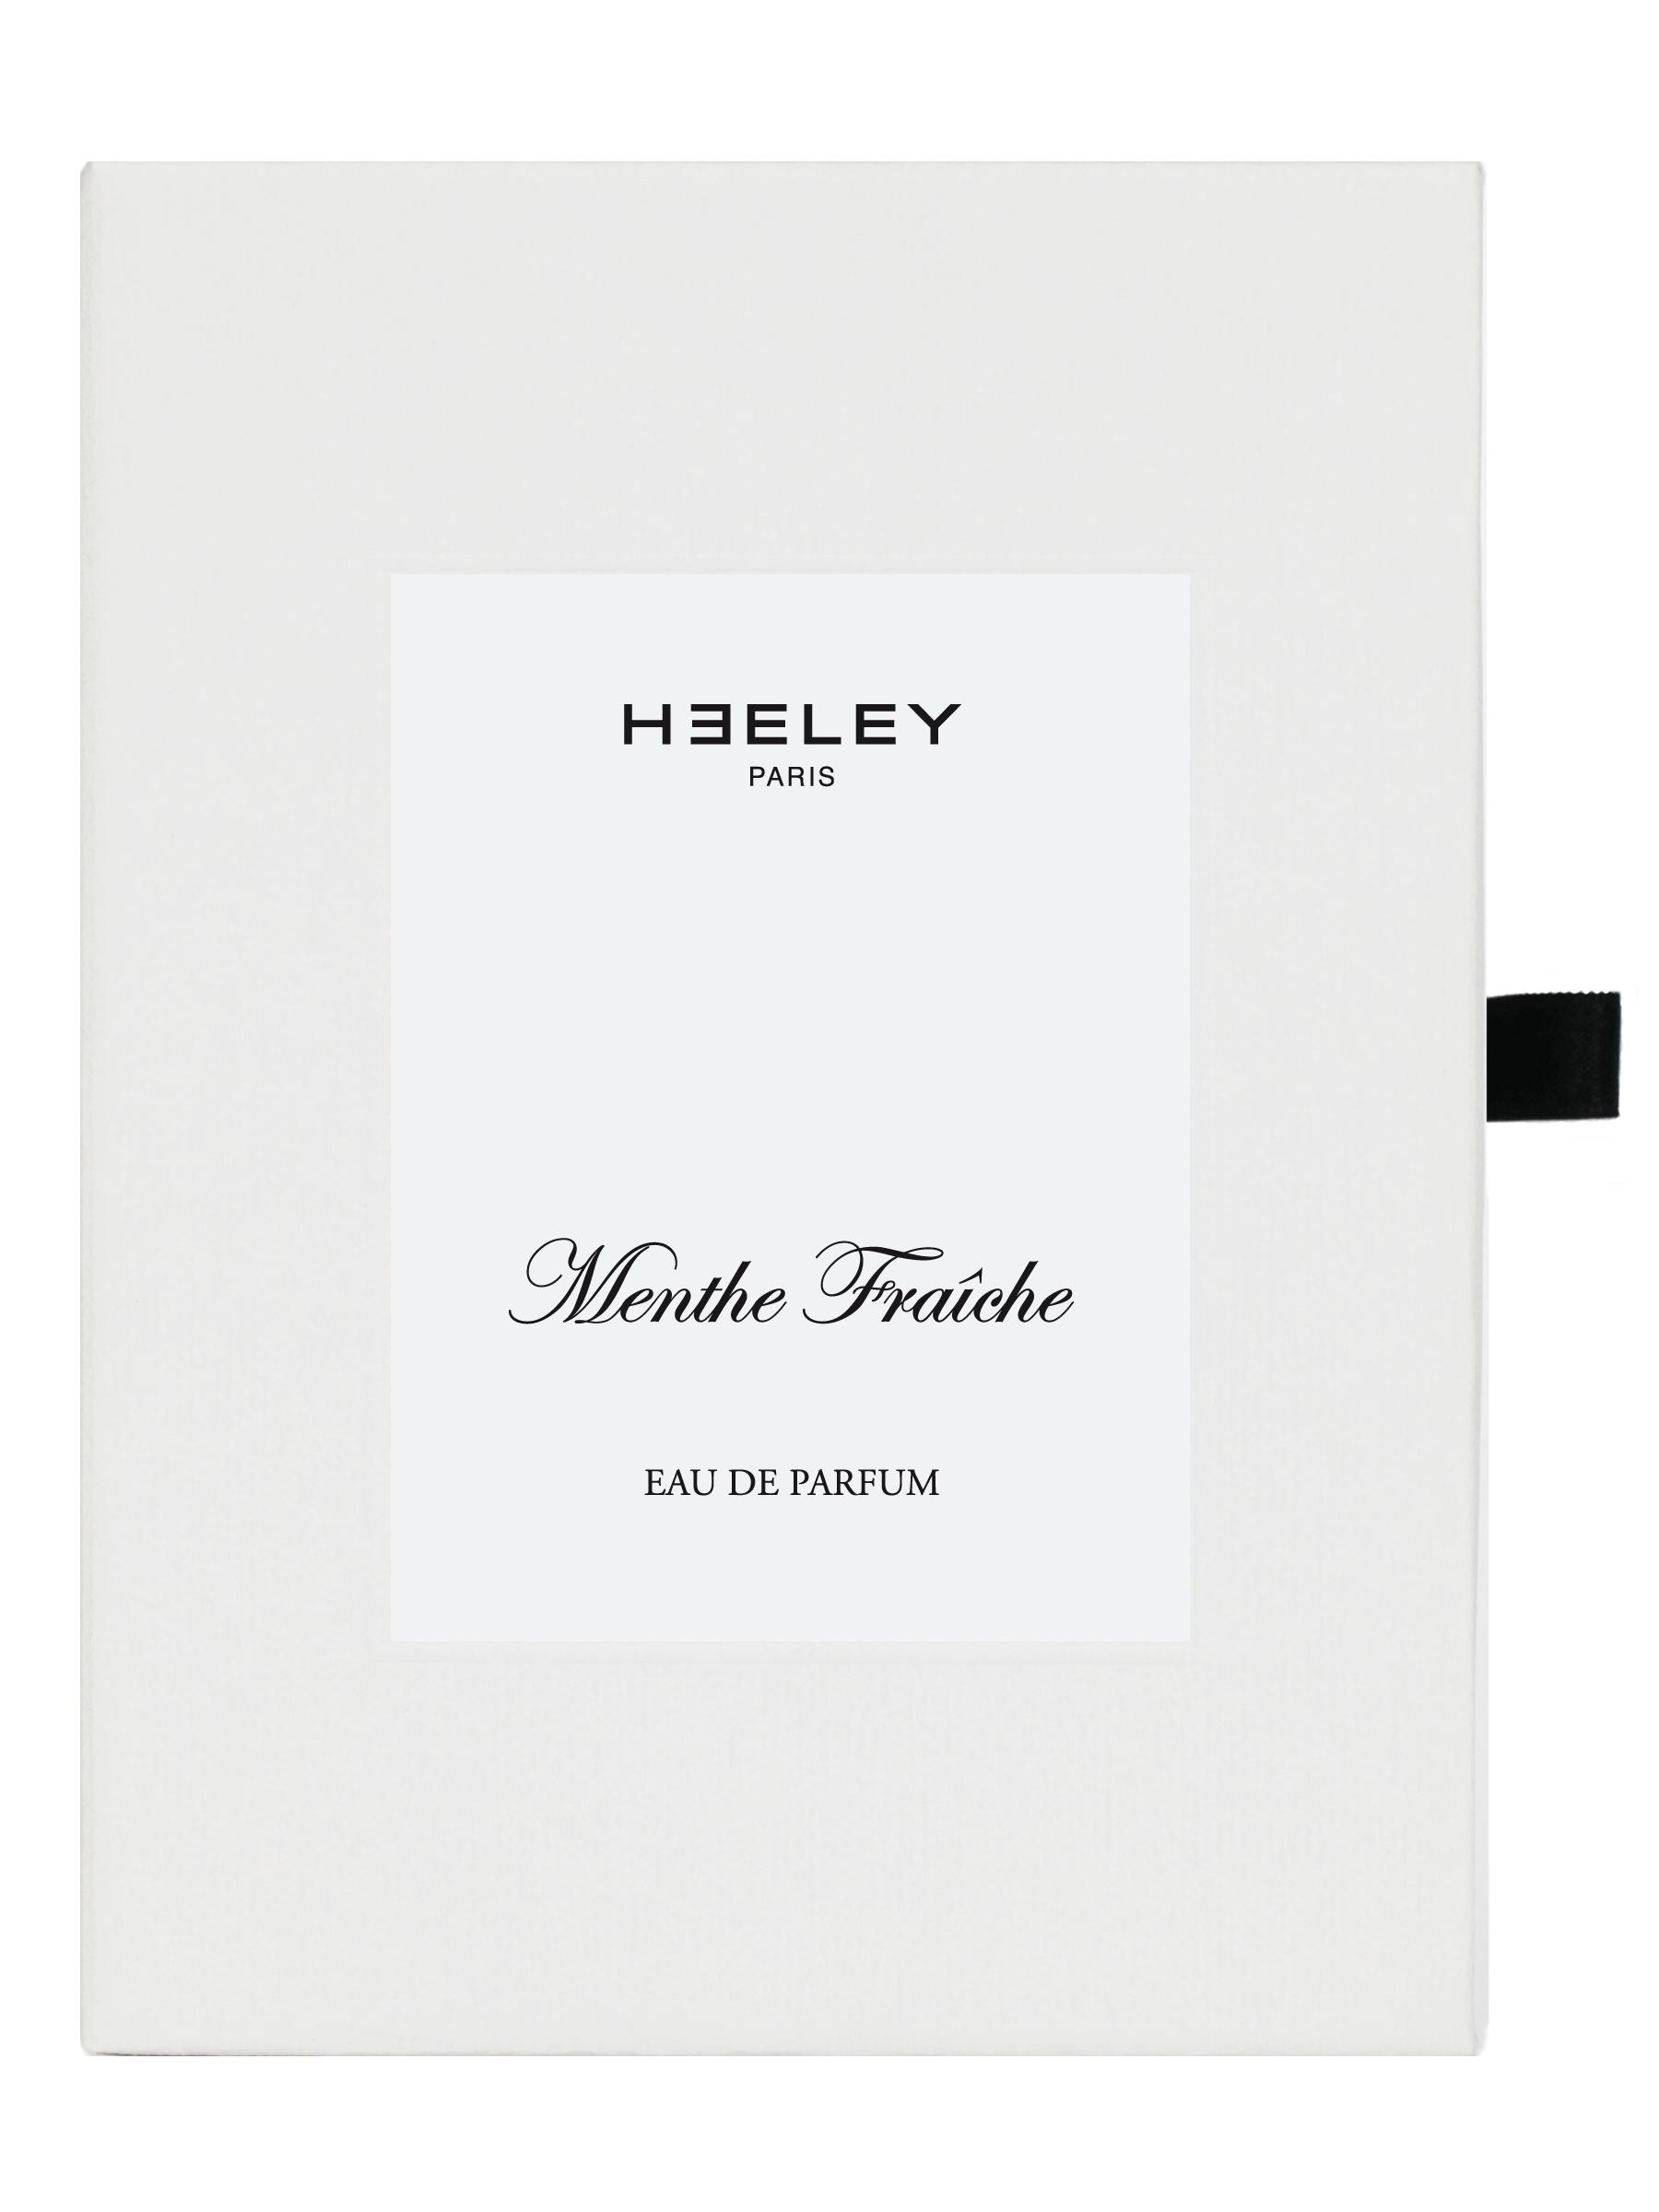 Heeley-EdP100ml-Menthe-Fraiche-box-1800x2400.png